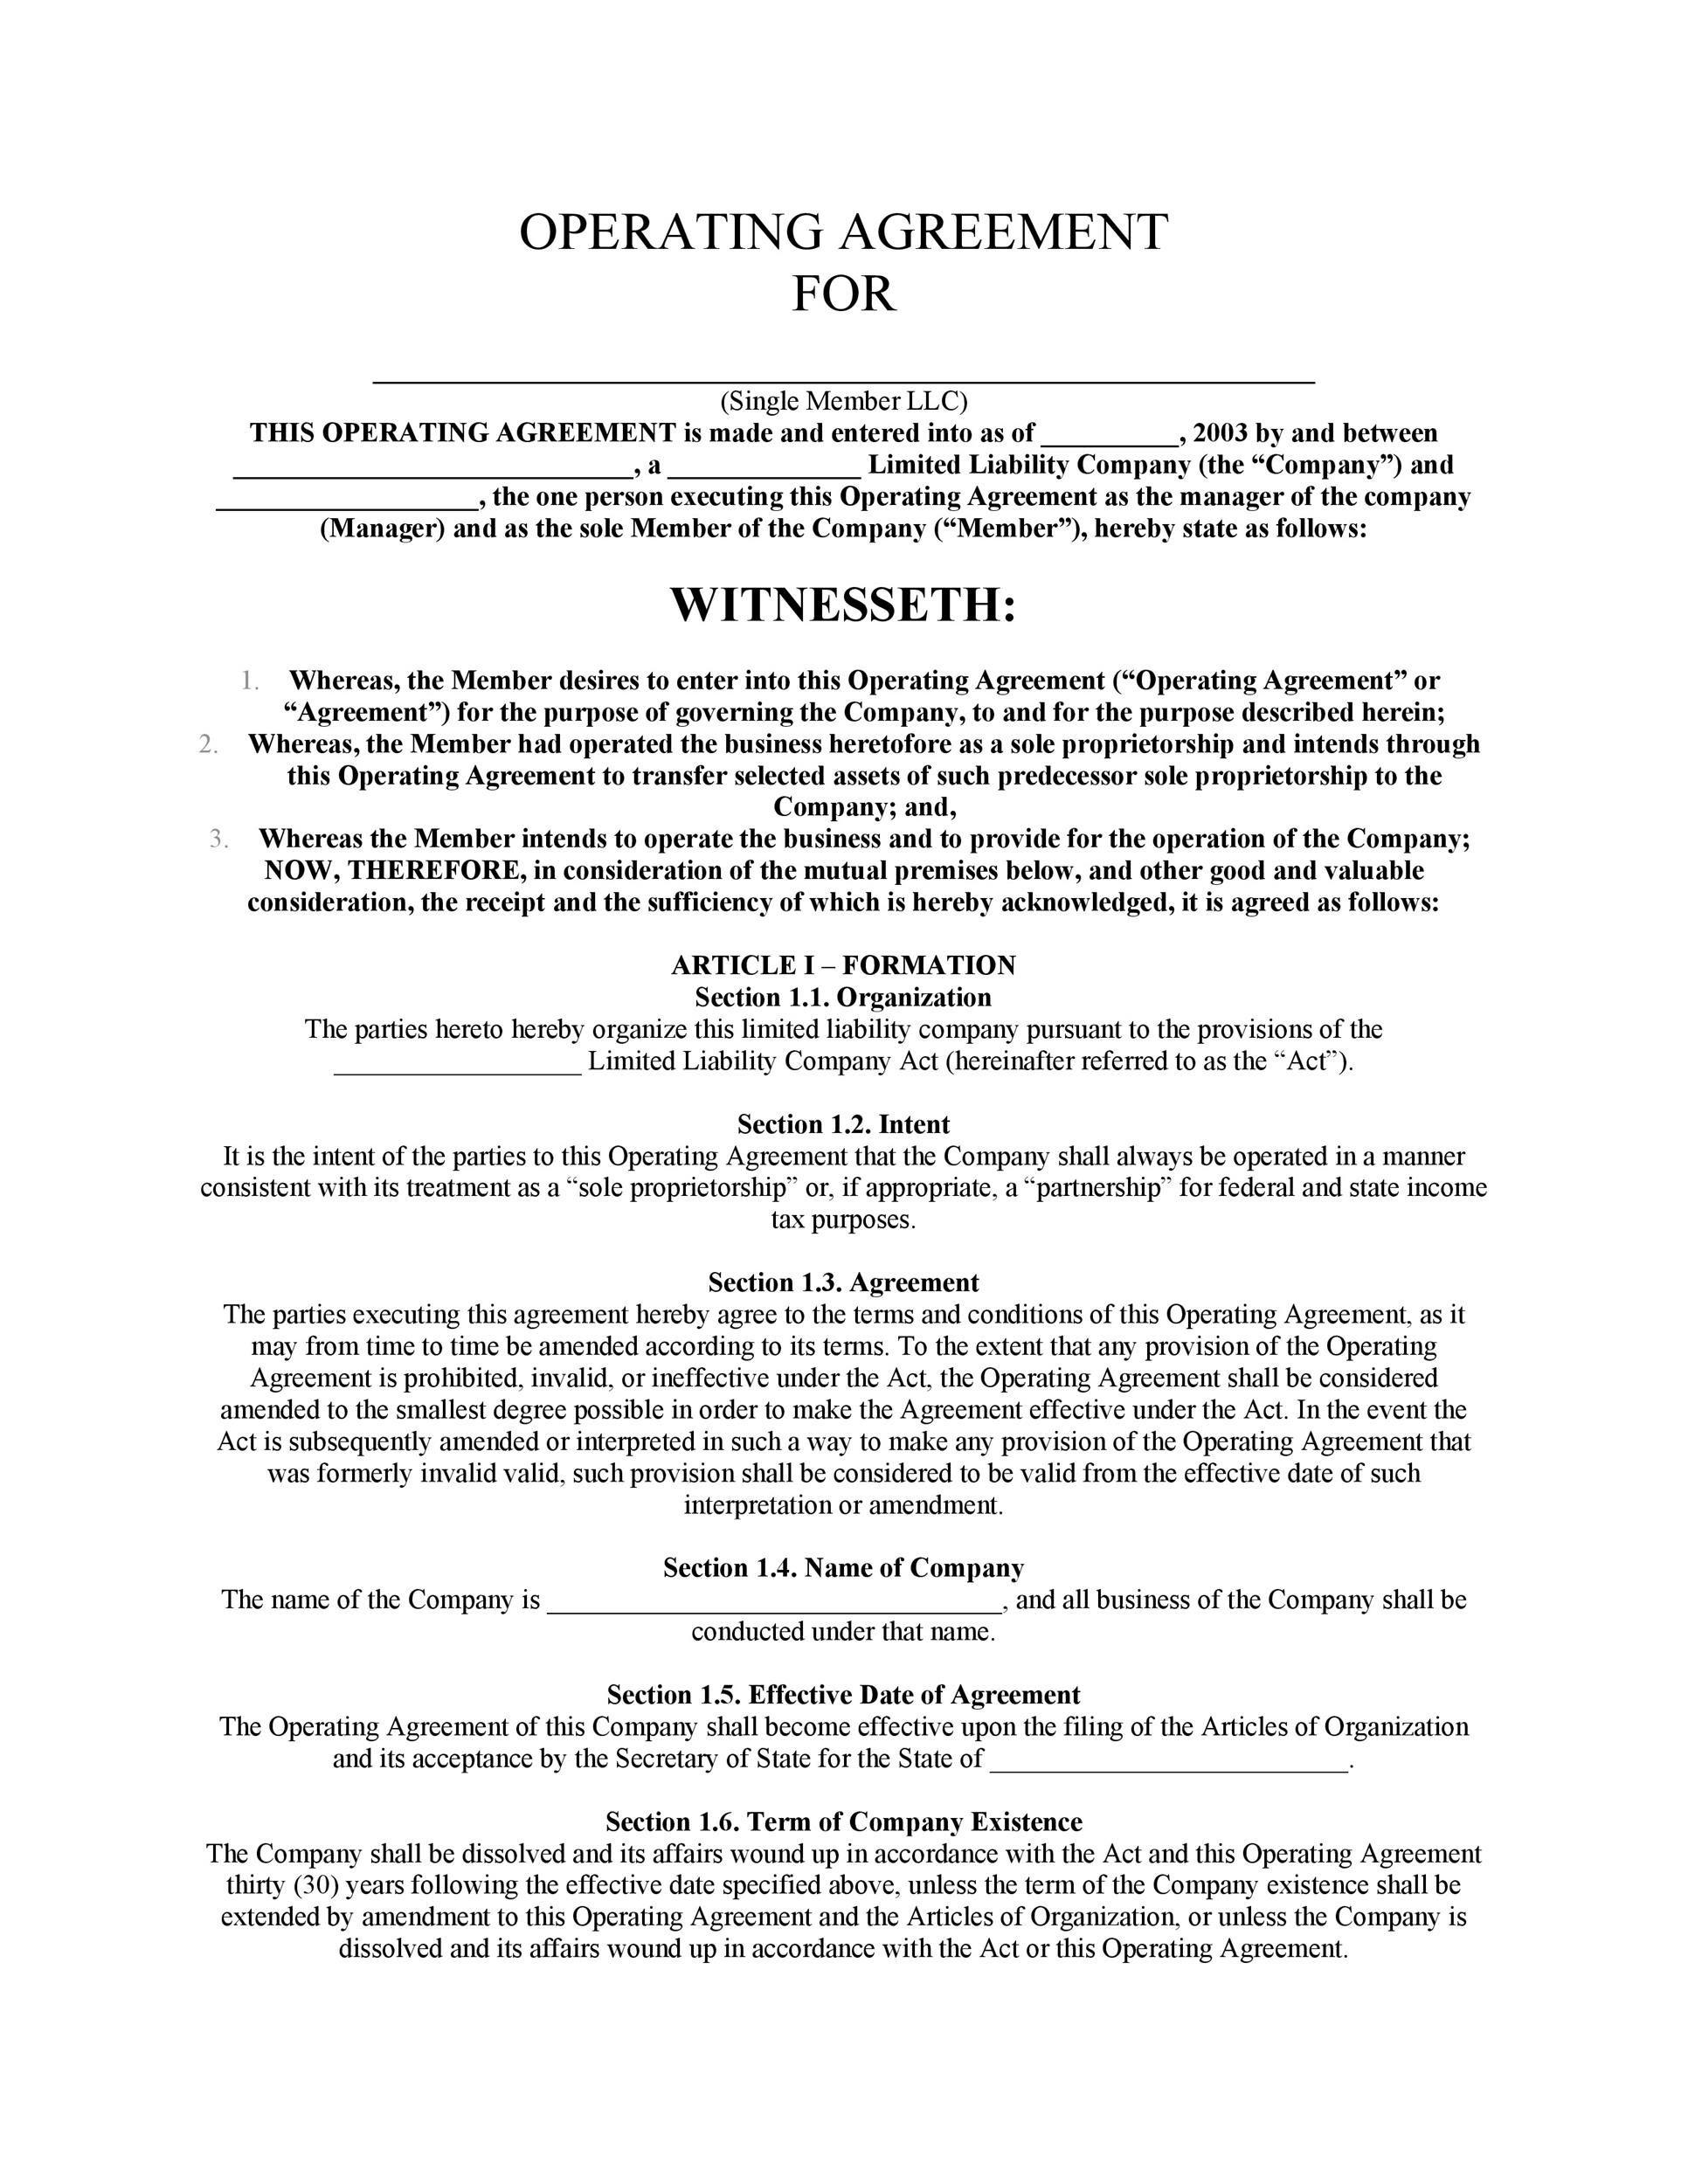 005 Rare Llc Partnership Agreement Template Design  Free OperatingFull